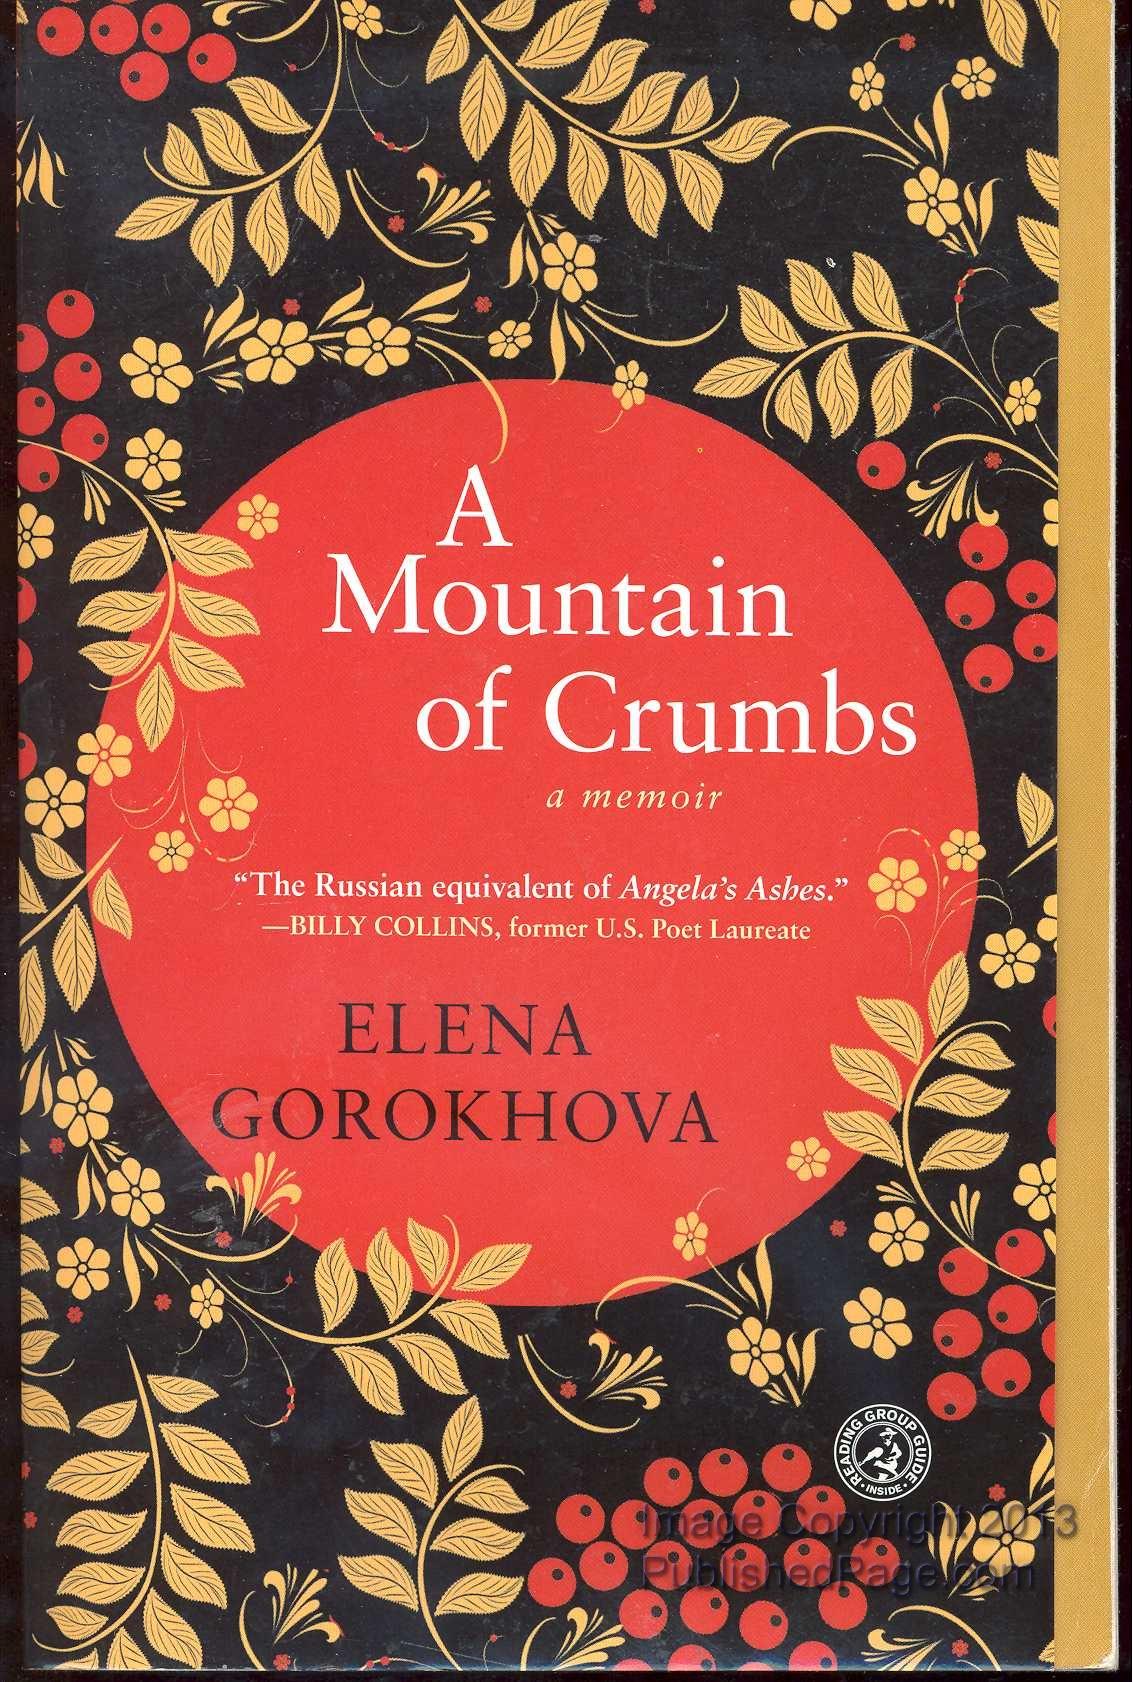 A Mountain of Crumbs:  A Memoir